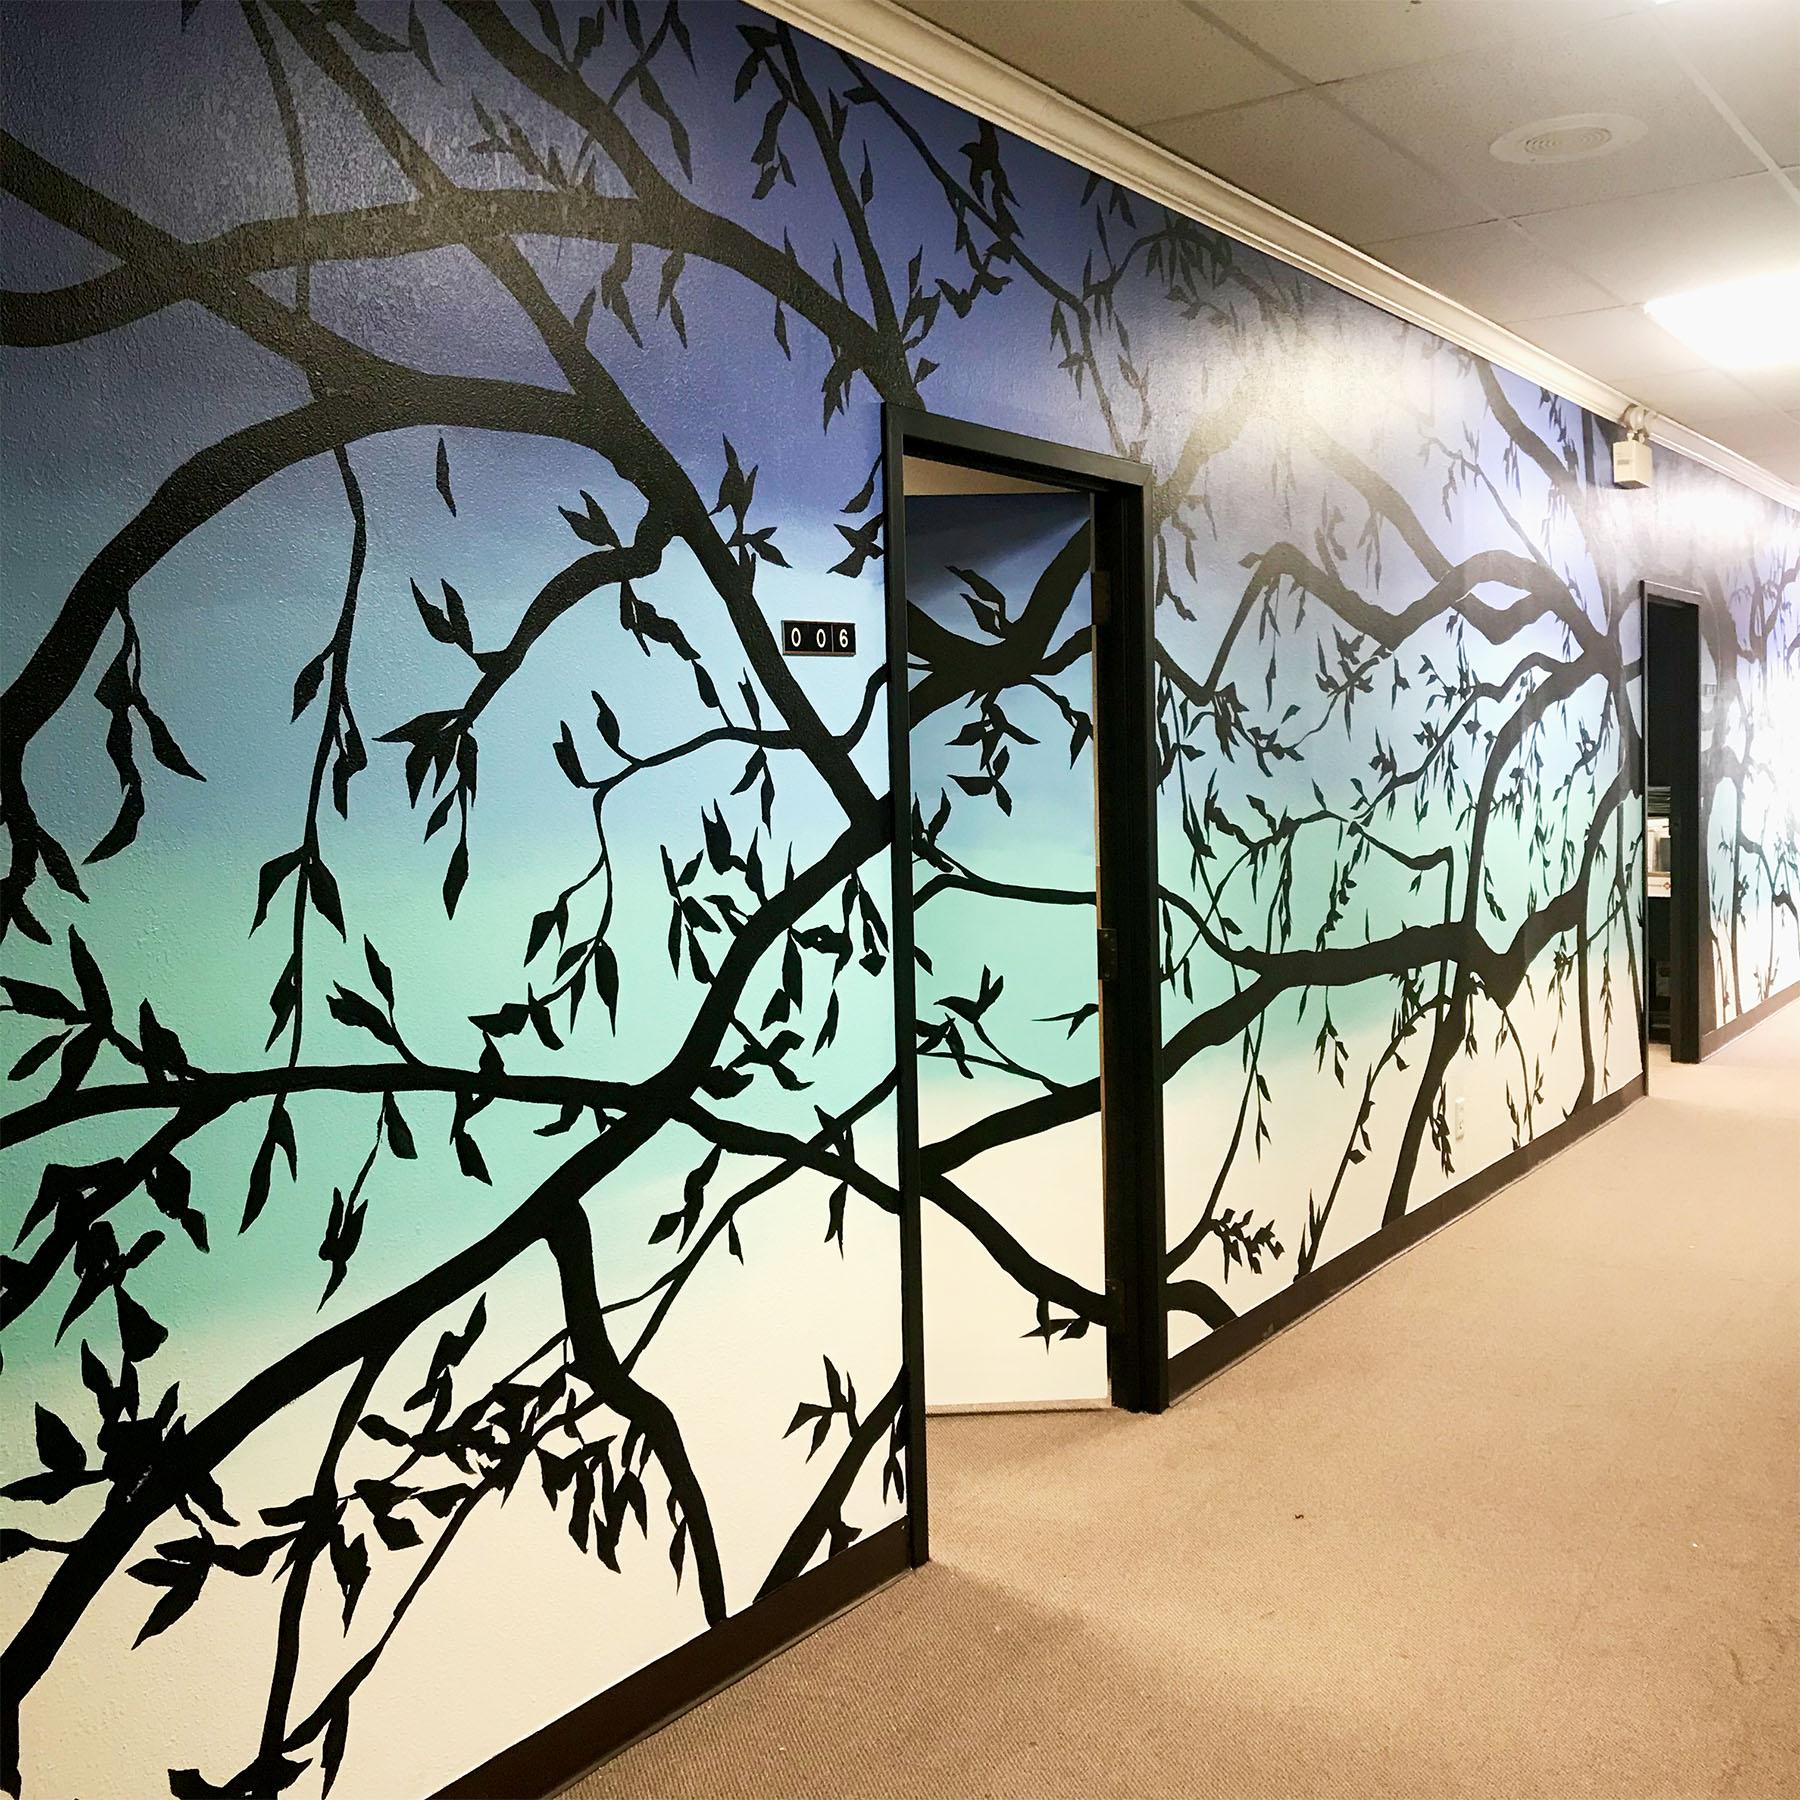 hombre tree - tree mural - custom mural - mural - Dace Kidd - Mural Artist Tx